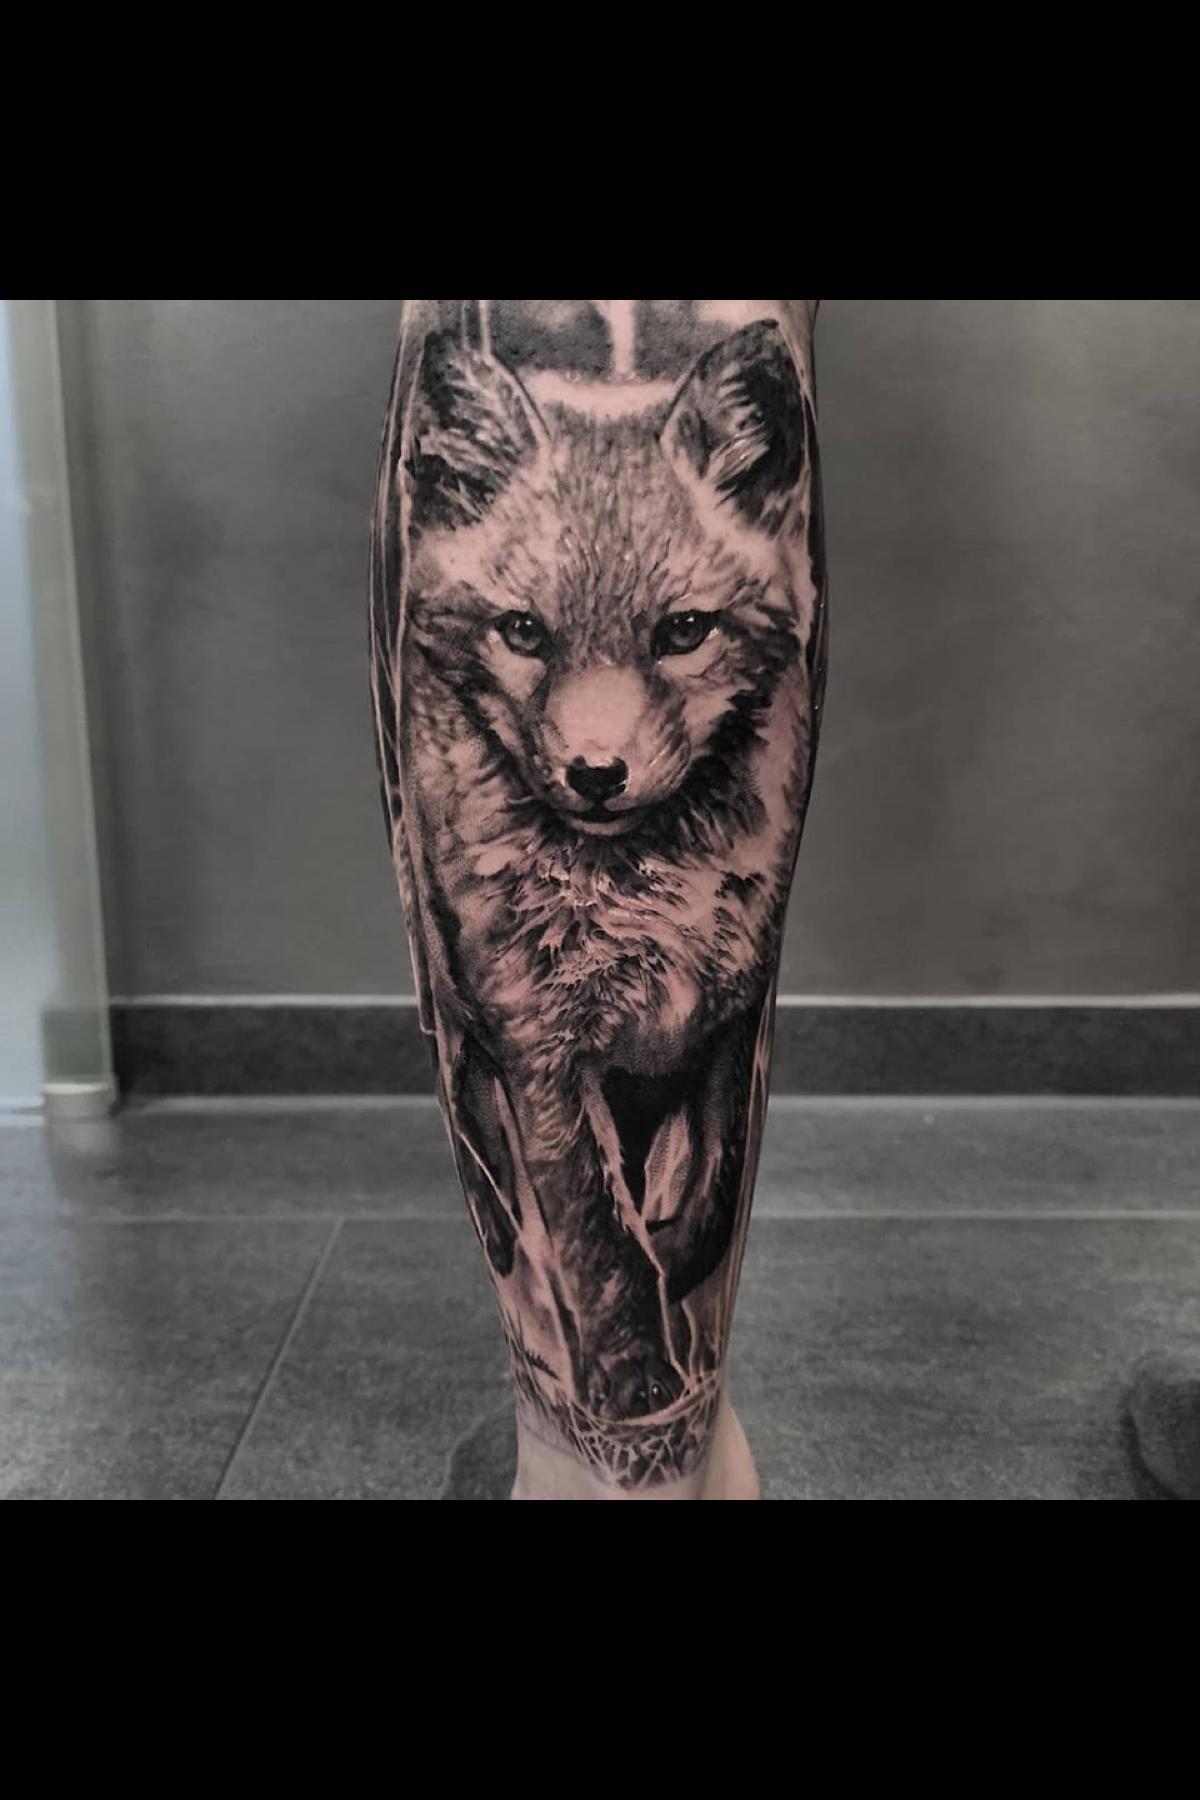 Realistic Black And Grey Fox Tattoo Made In Germany By John Hudic Fox Tattoo Baby Owl Tattoos Black And Grey Tattoos